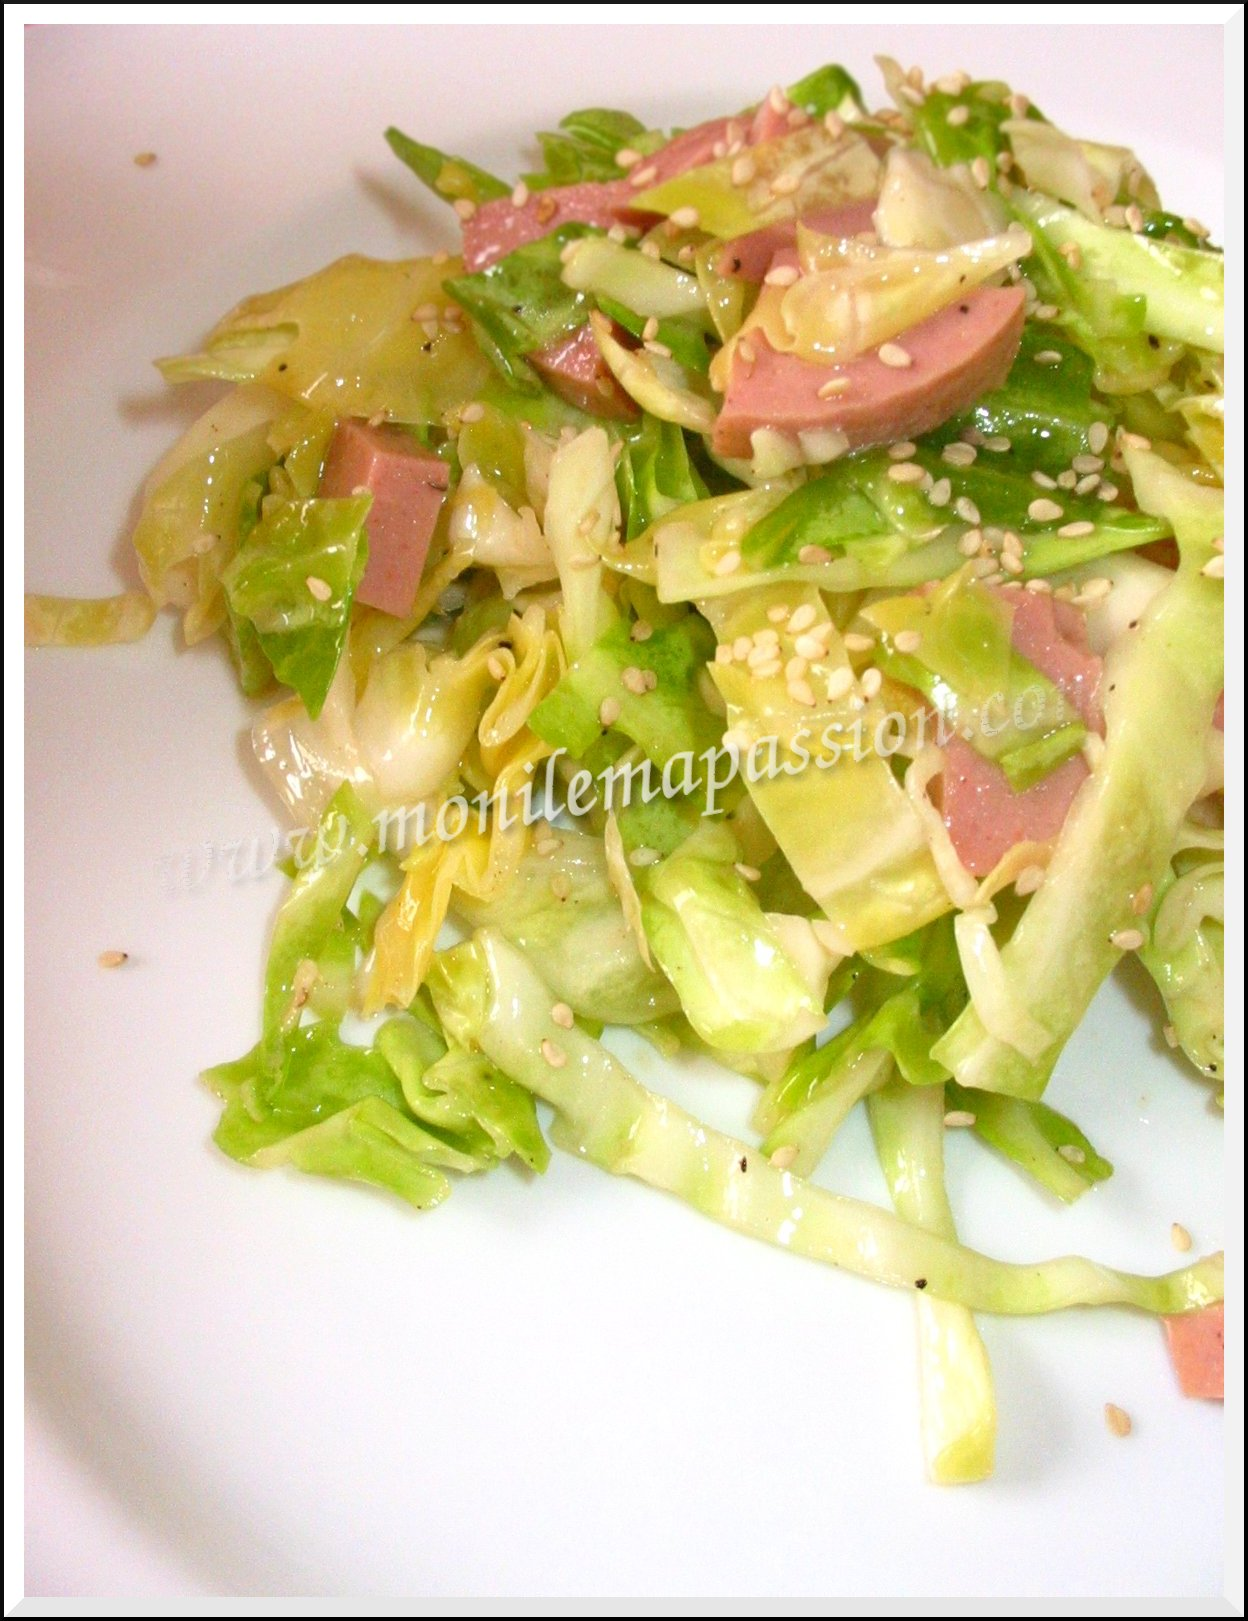 Salade de chou vert au saucisson de volaille